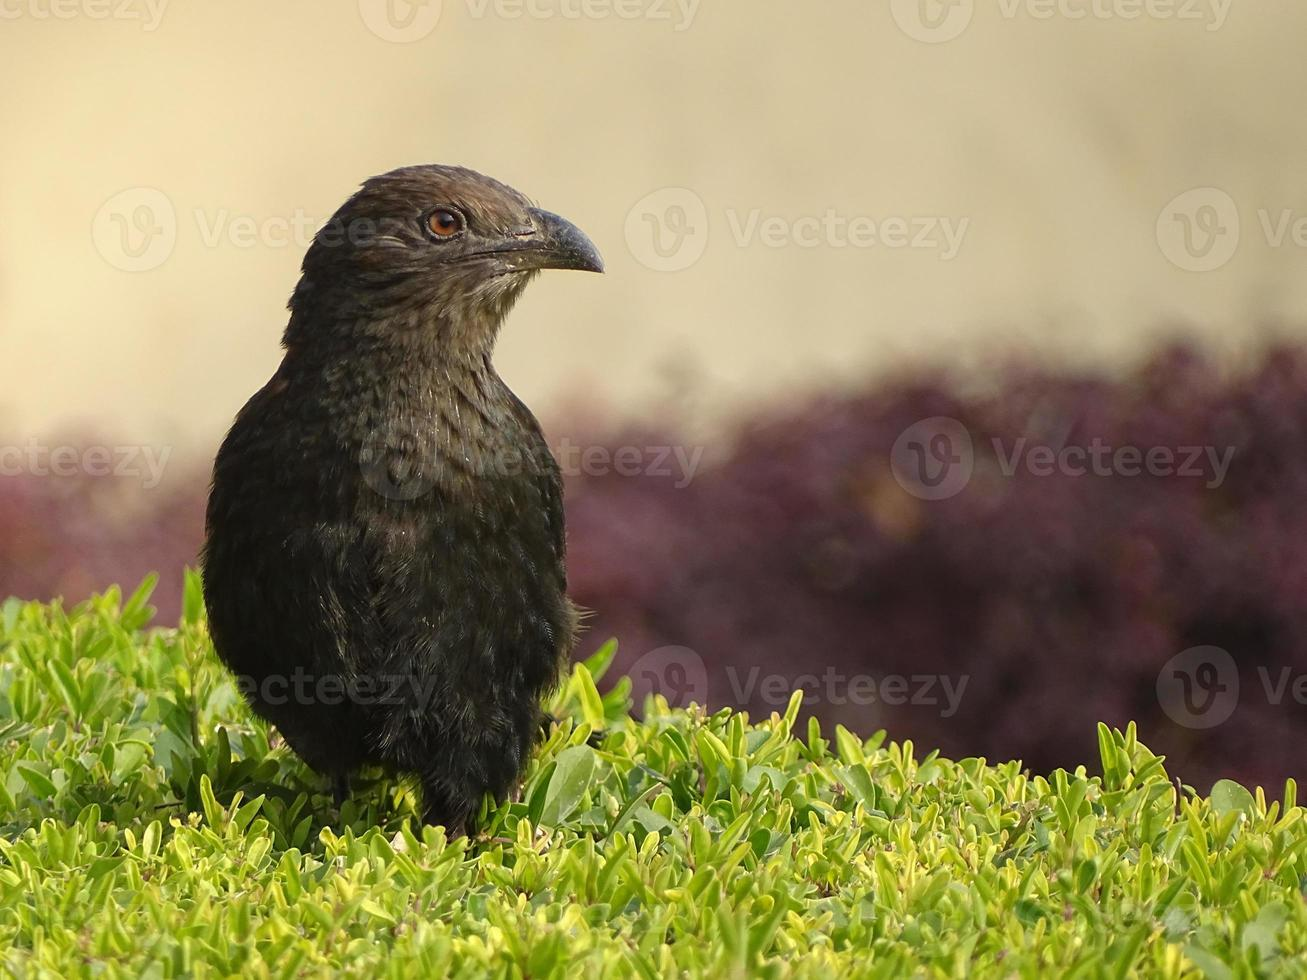 Crow Pheasant (Centropus sinensis) photo